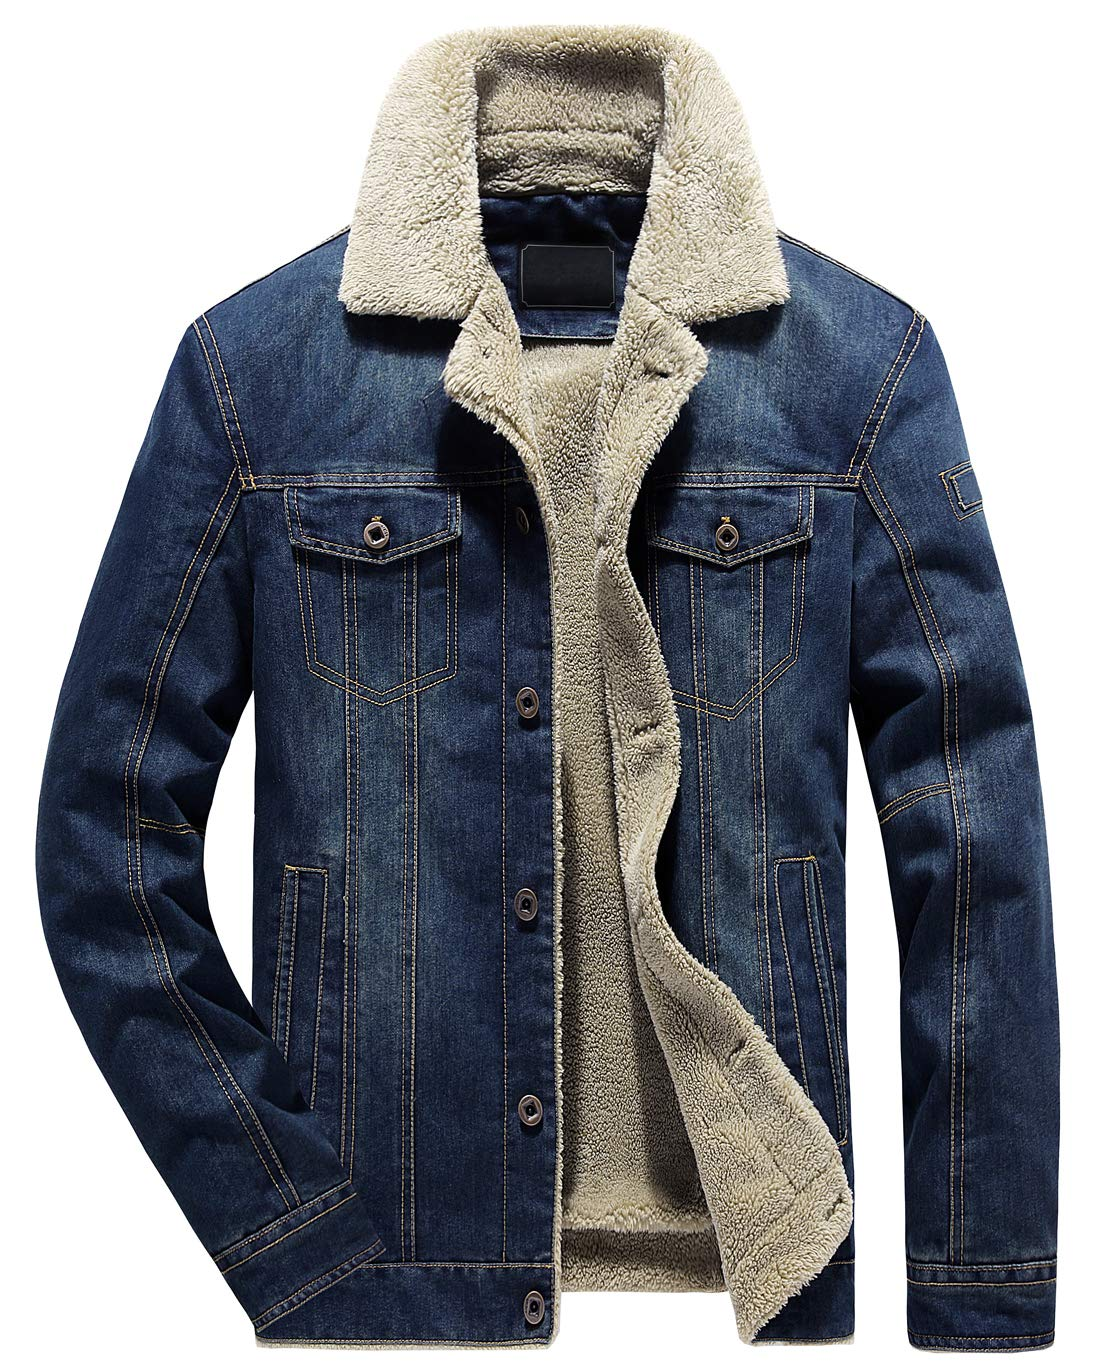 chouyatou Men's Classic Button Front Rugged Sherpa Lined Denim Trucker Jackets (Medium, Dark Blue) by chouyatou